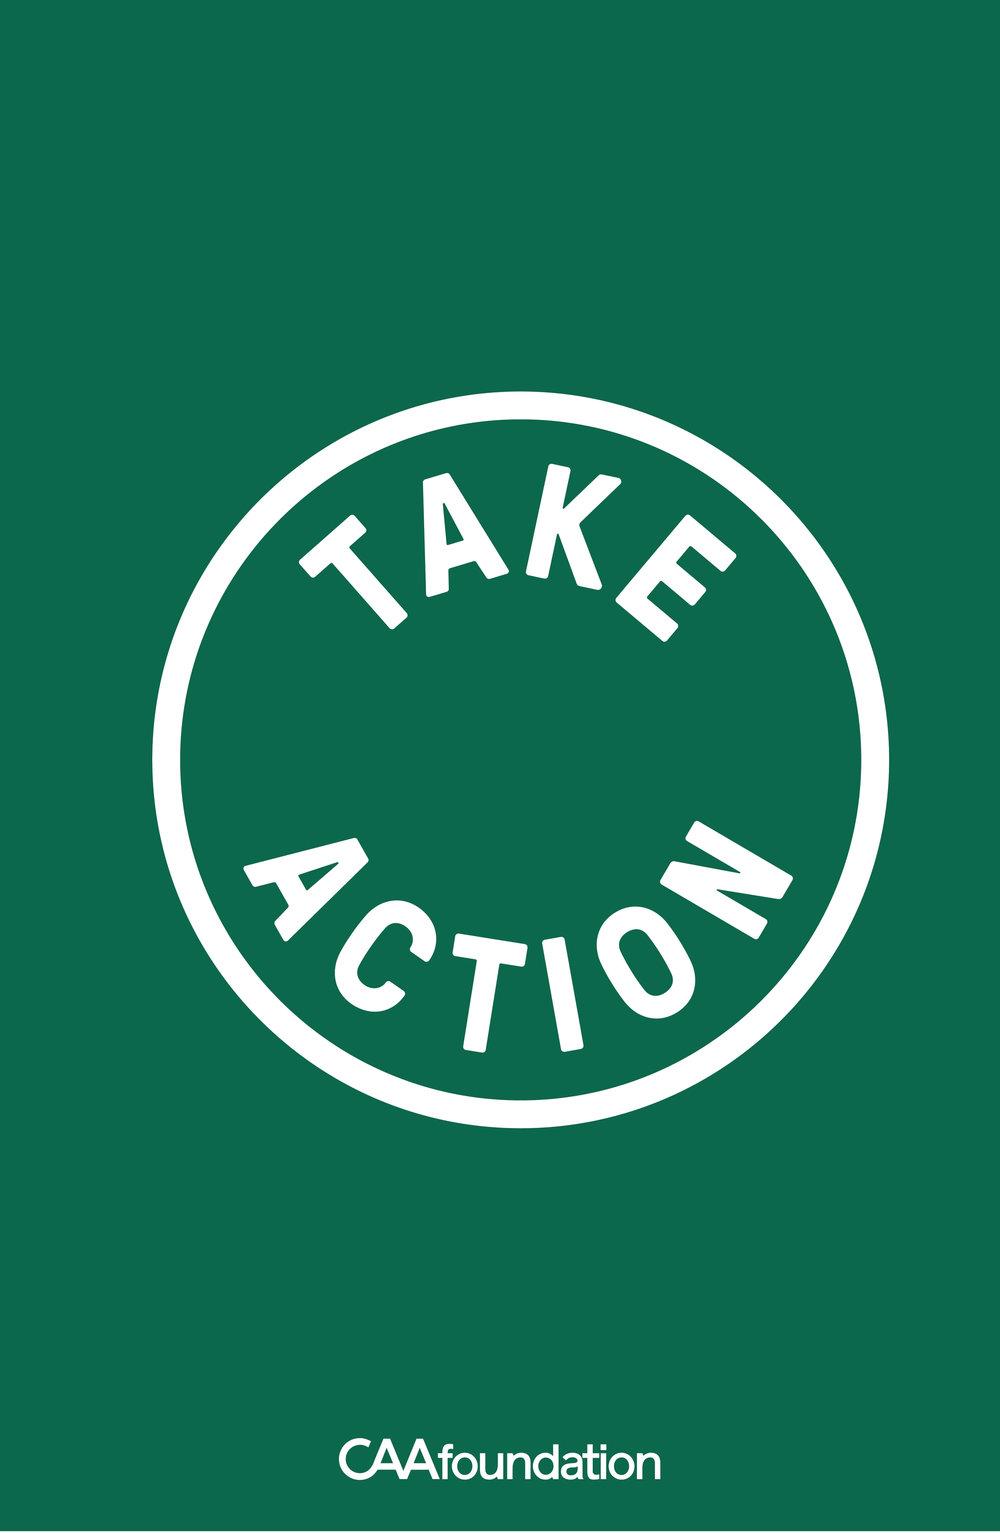 Take_Action_Posters_v5-30.jpg